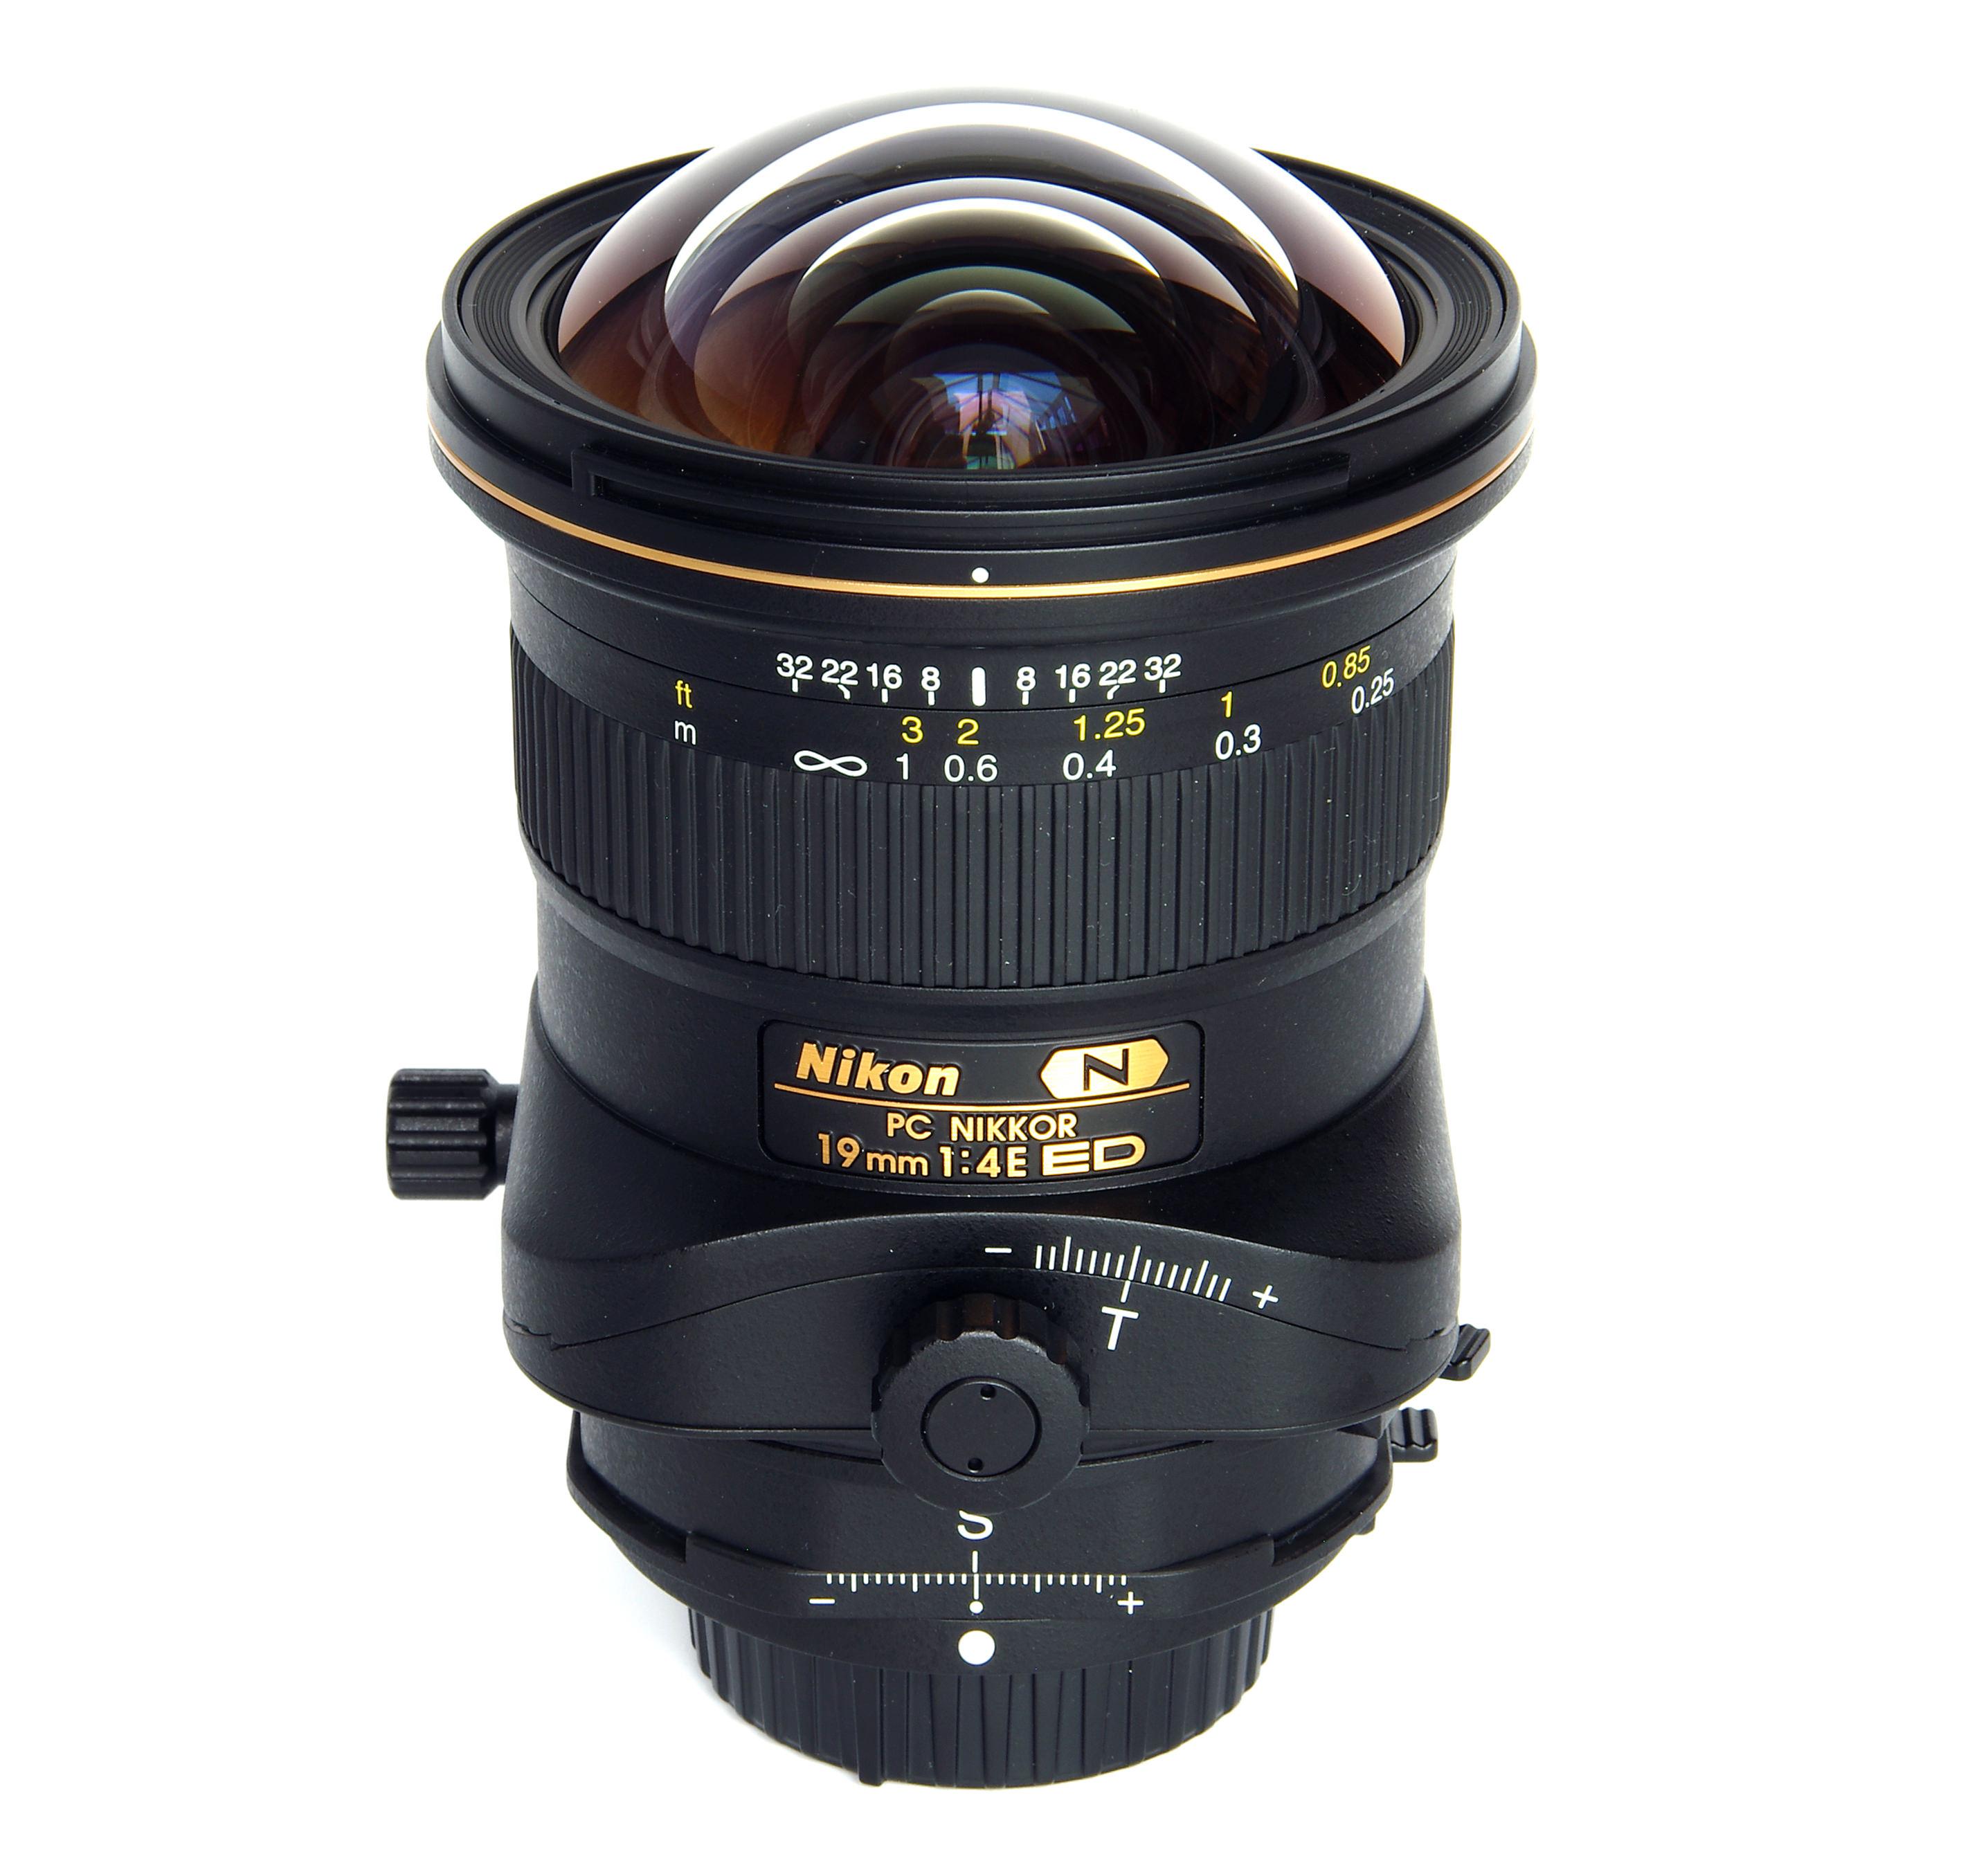 Nikon PC Nikkor 19mm f/4 E ED Tilt Shift Lens Review | ePHOTOzine